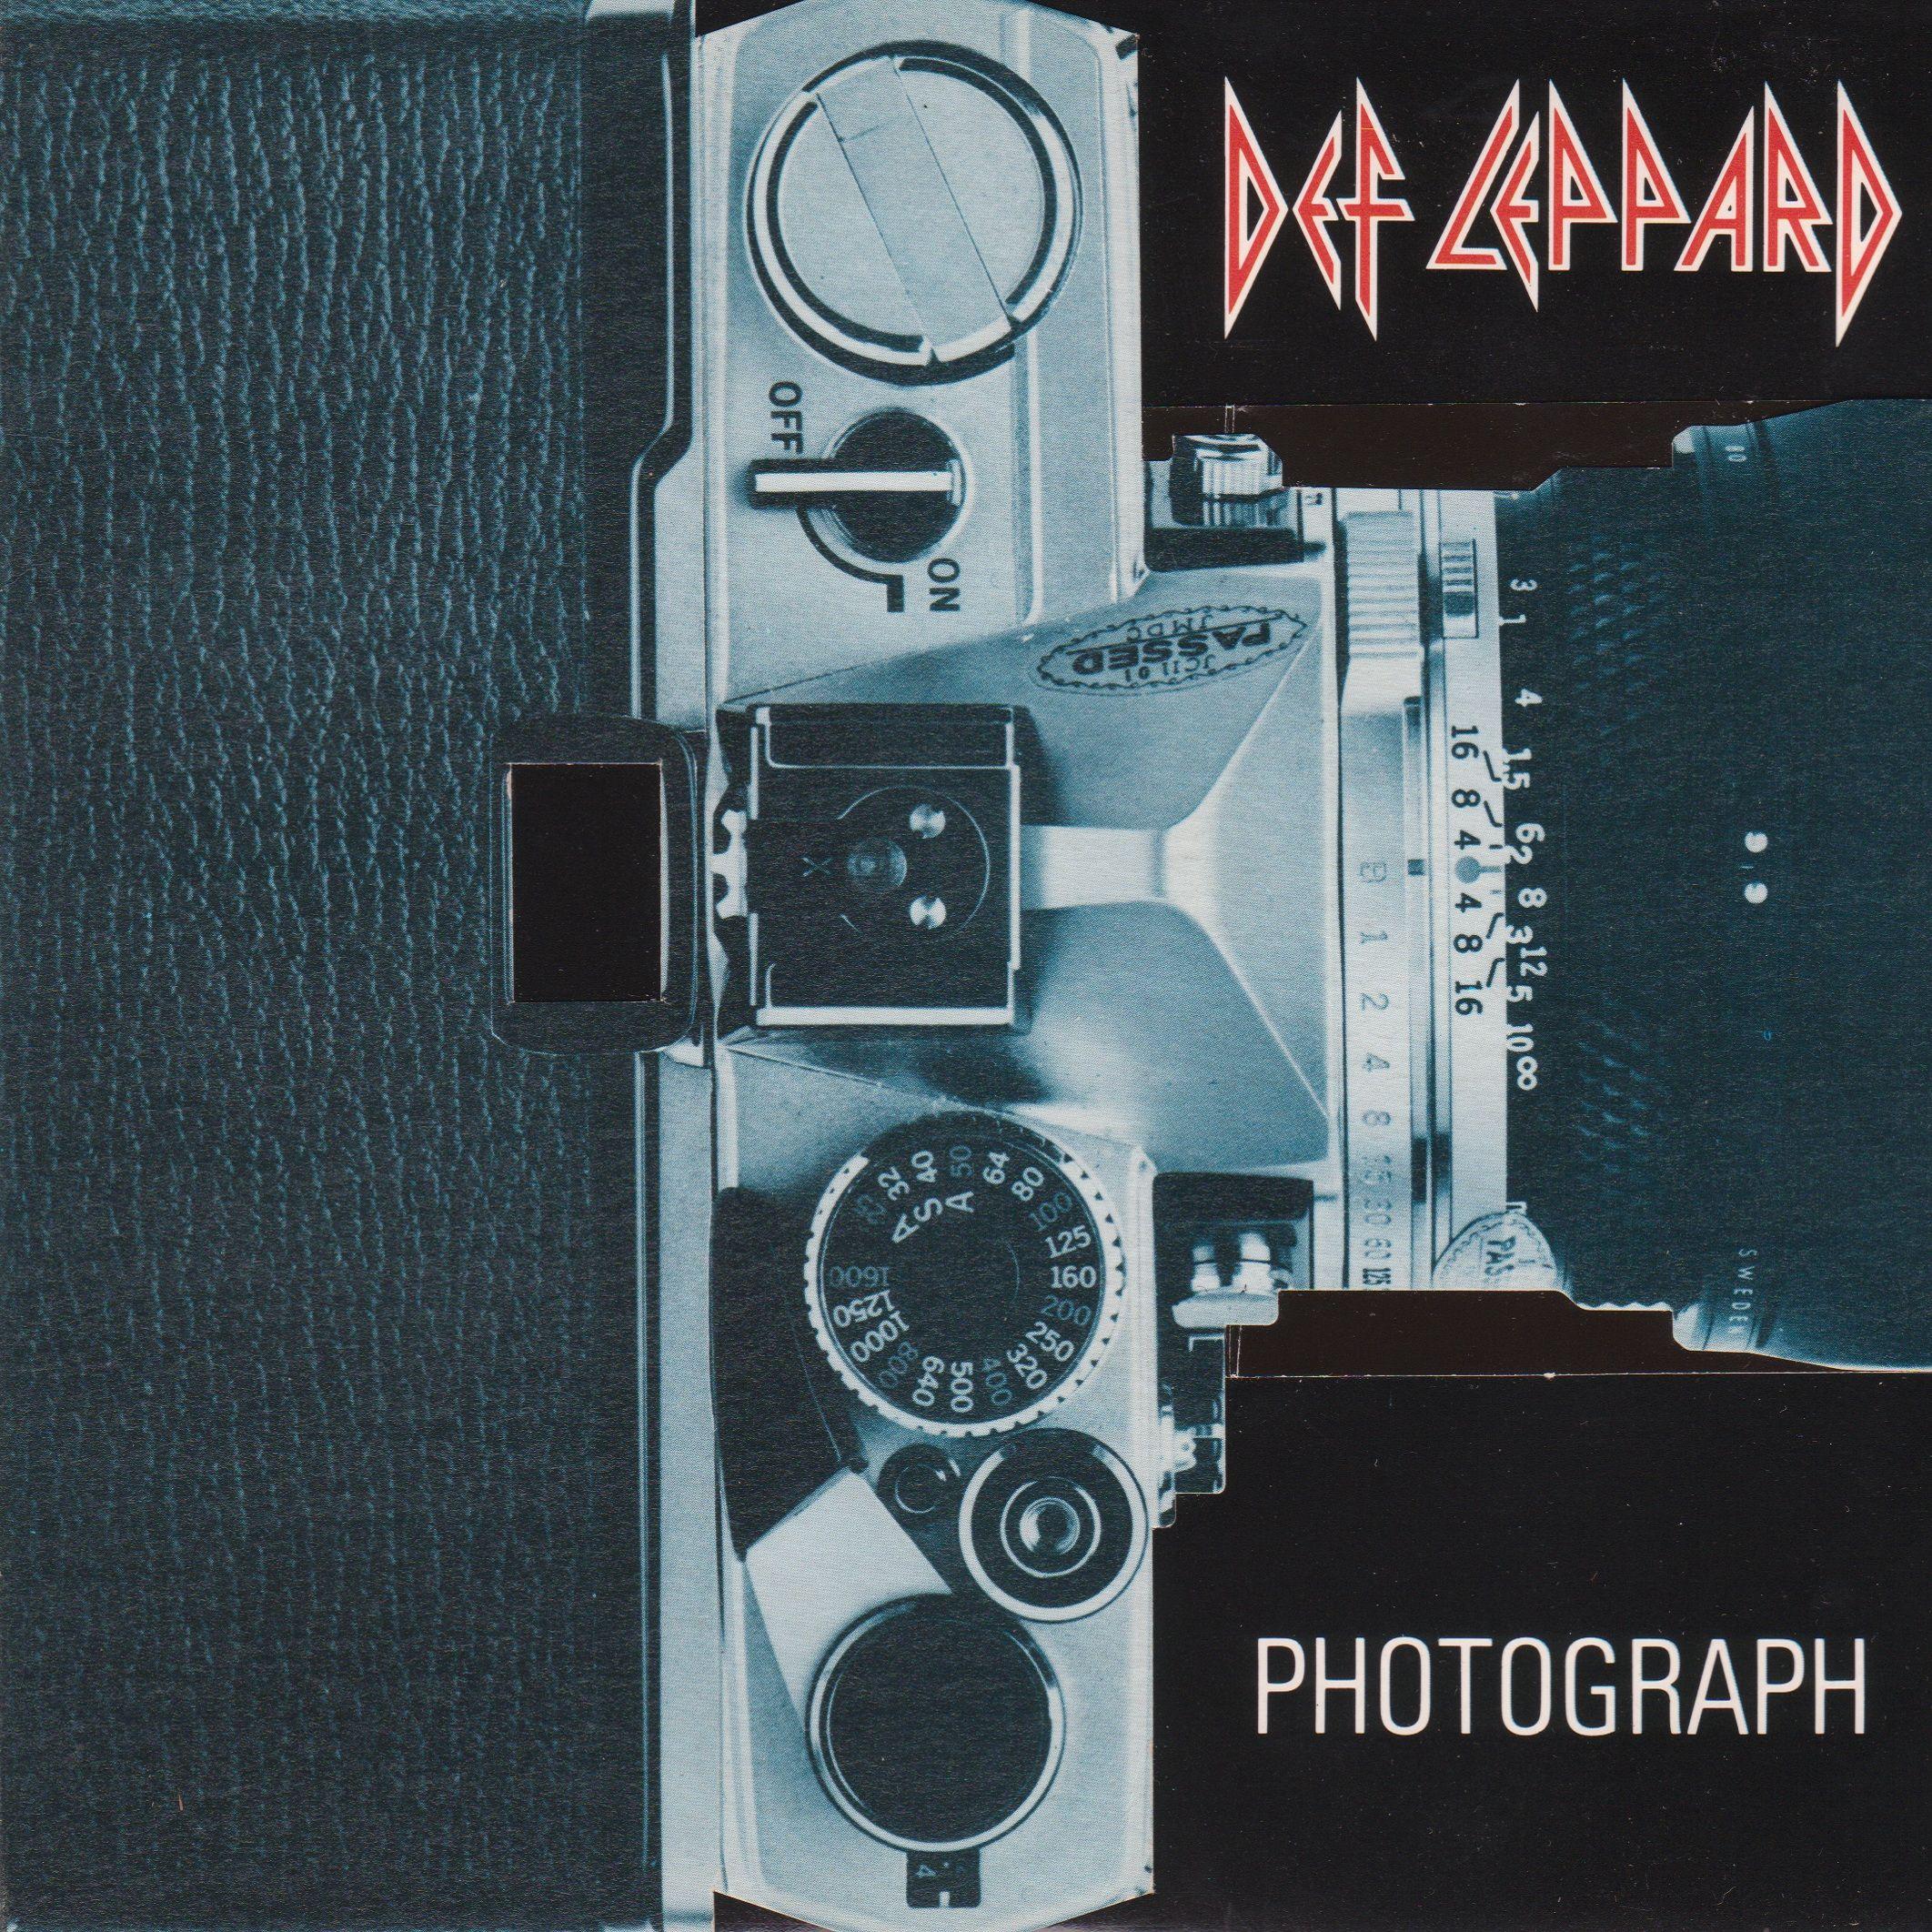 Def Leppard – Photograph (single cover art)